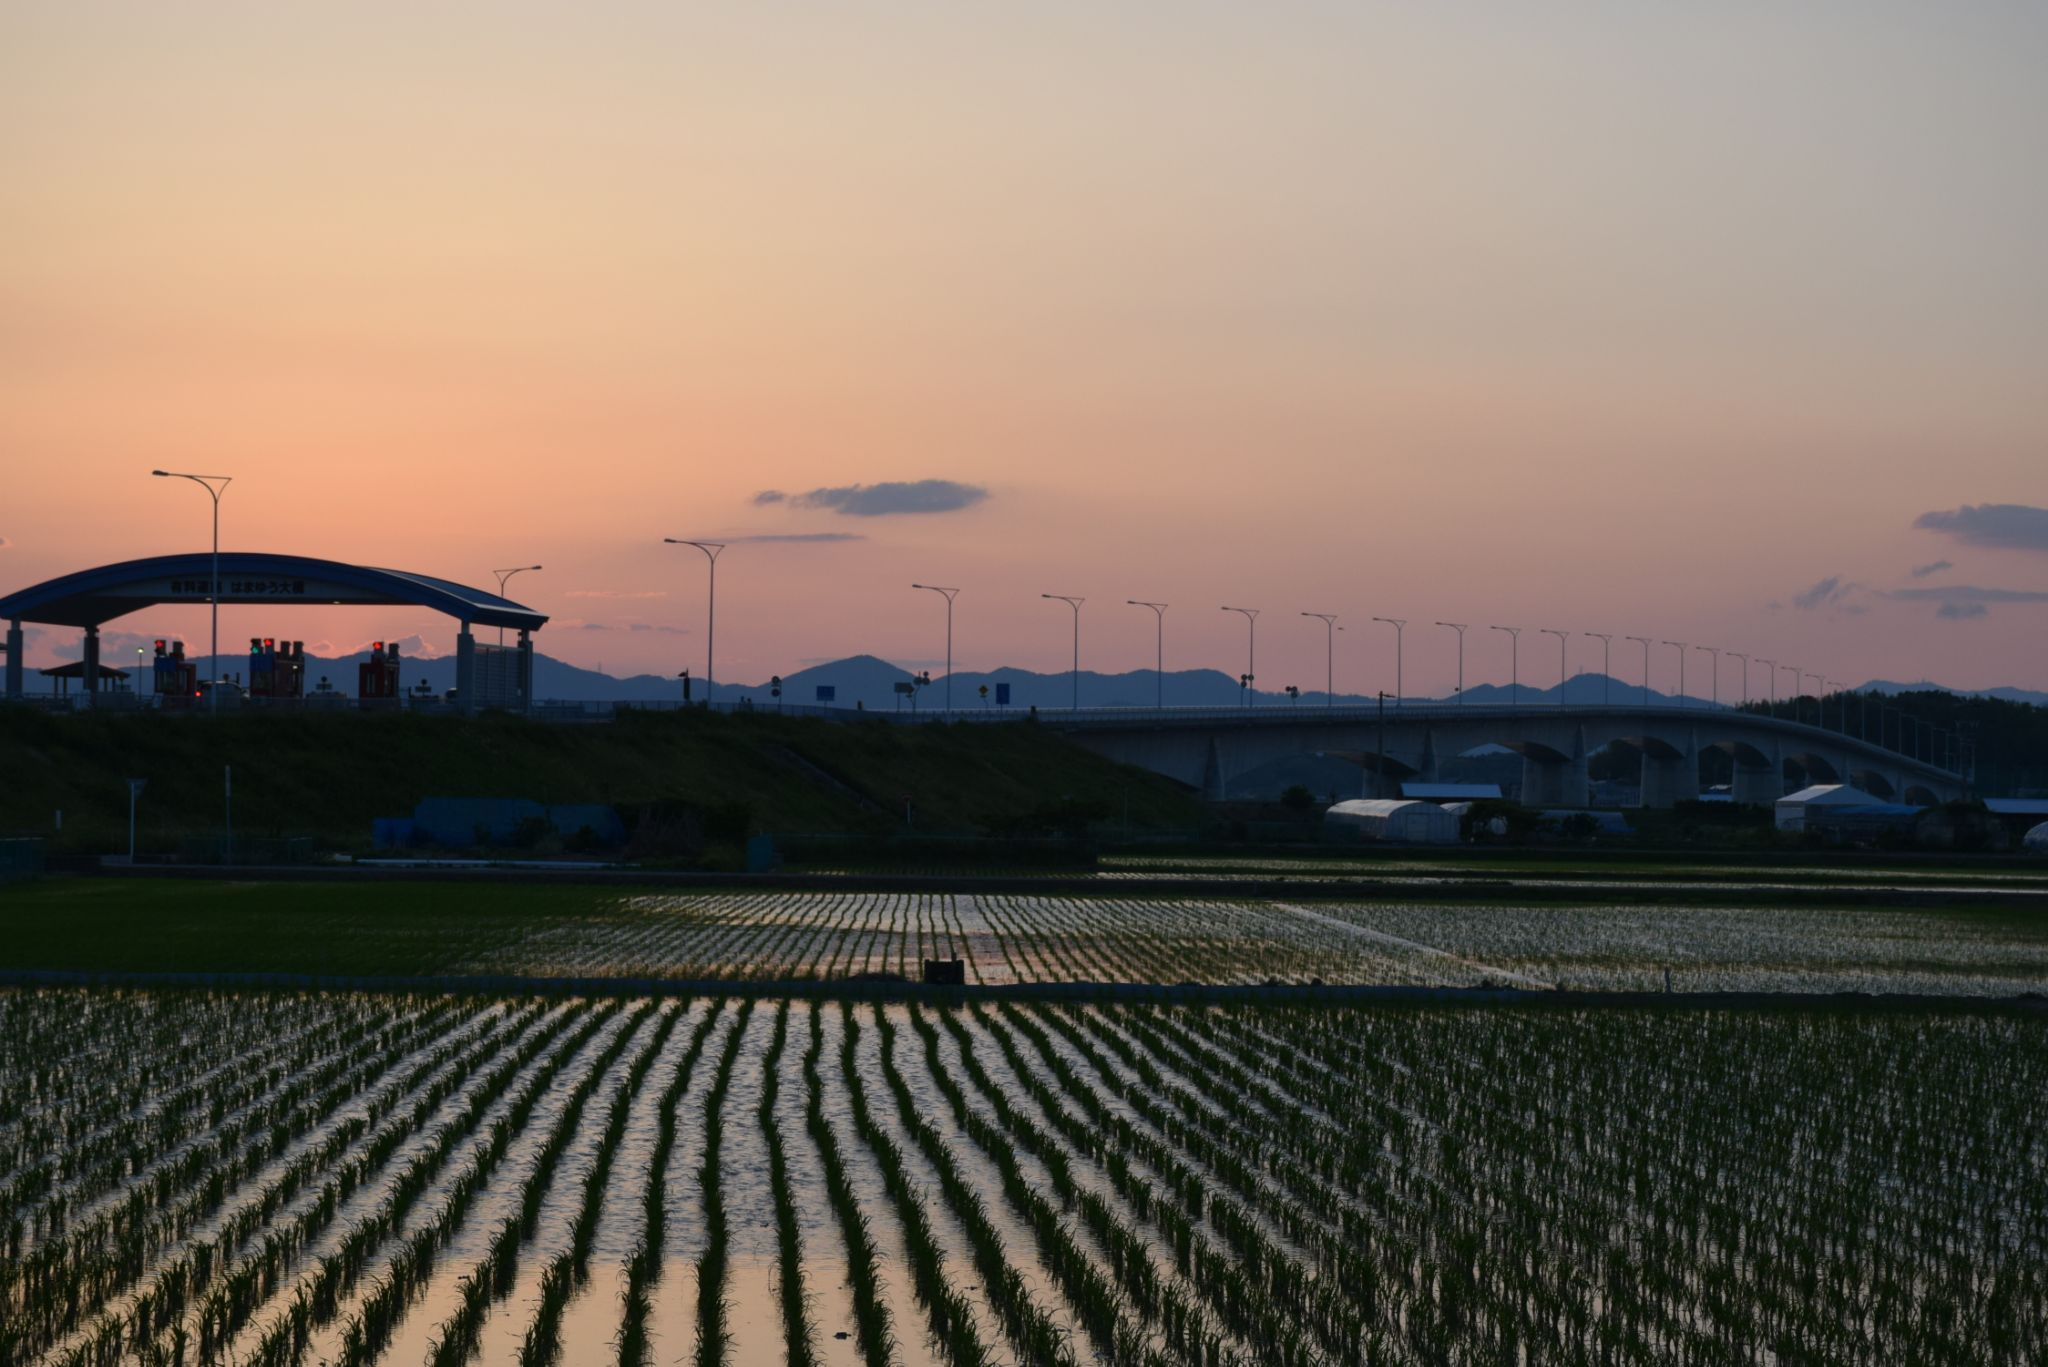 sunset & rice paddy by Keita Asakura